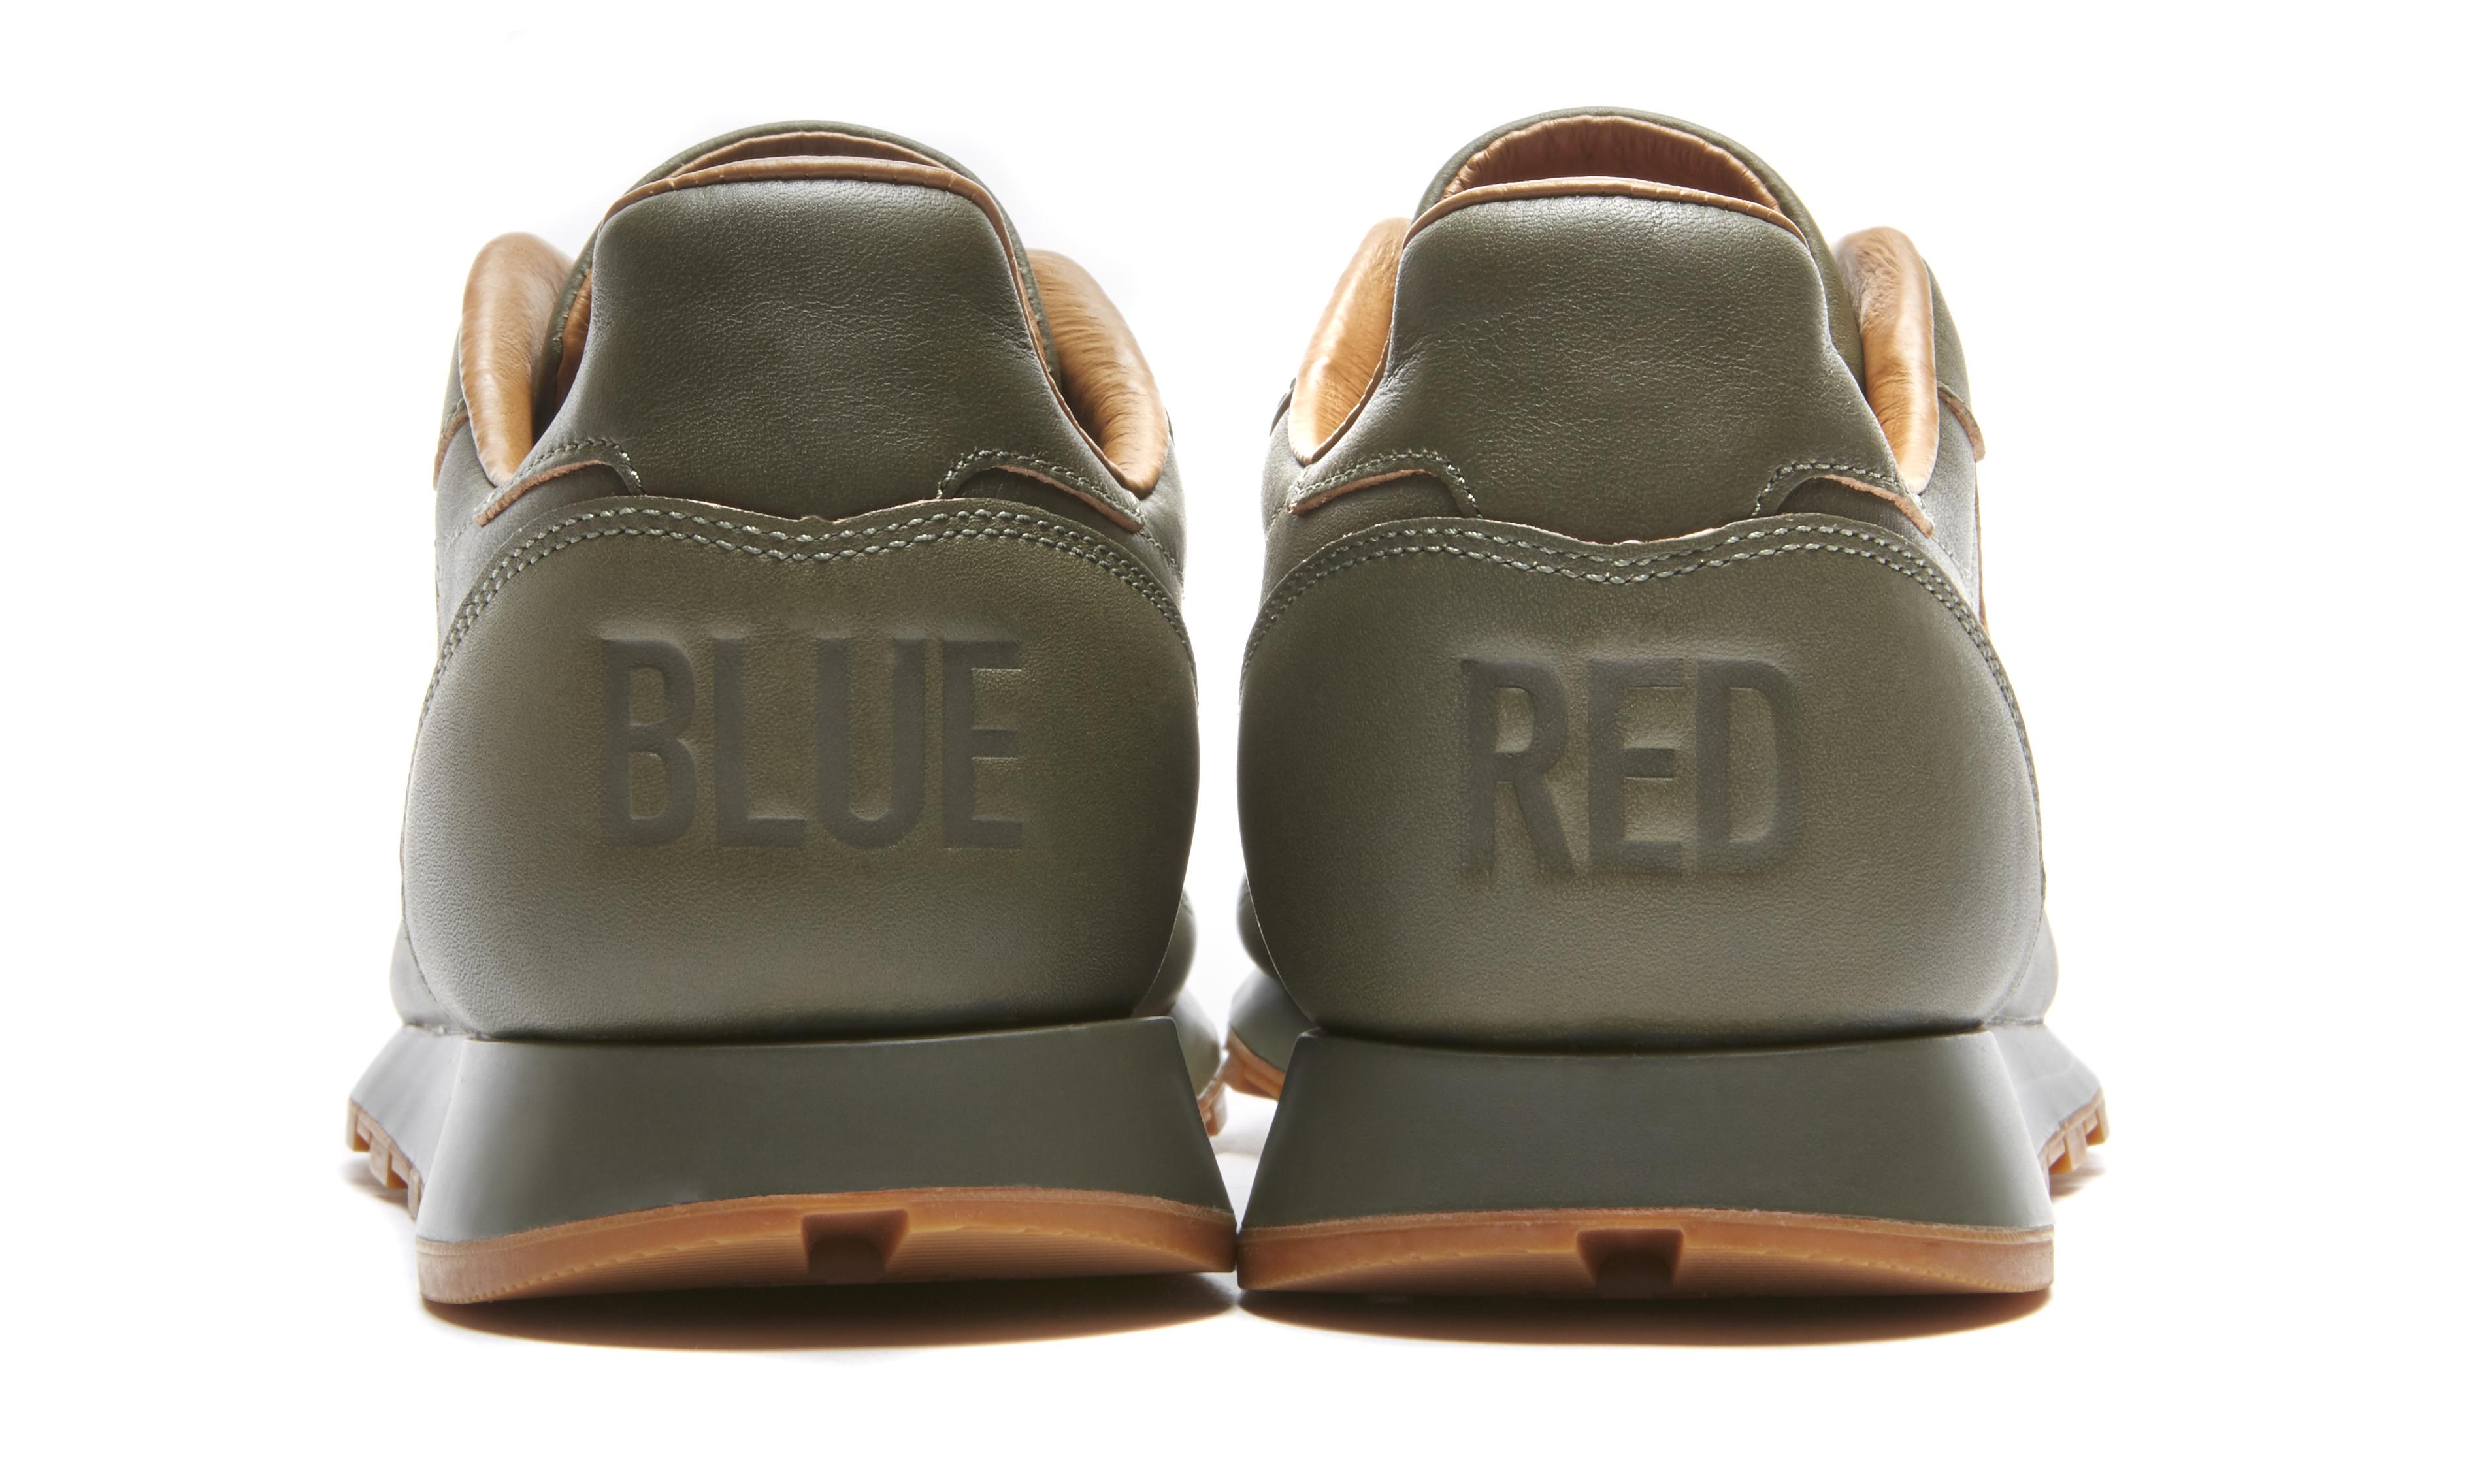 Kendrick Lamar Reebok Classic Leather Green Heel